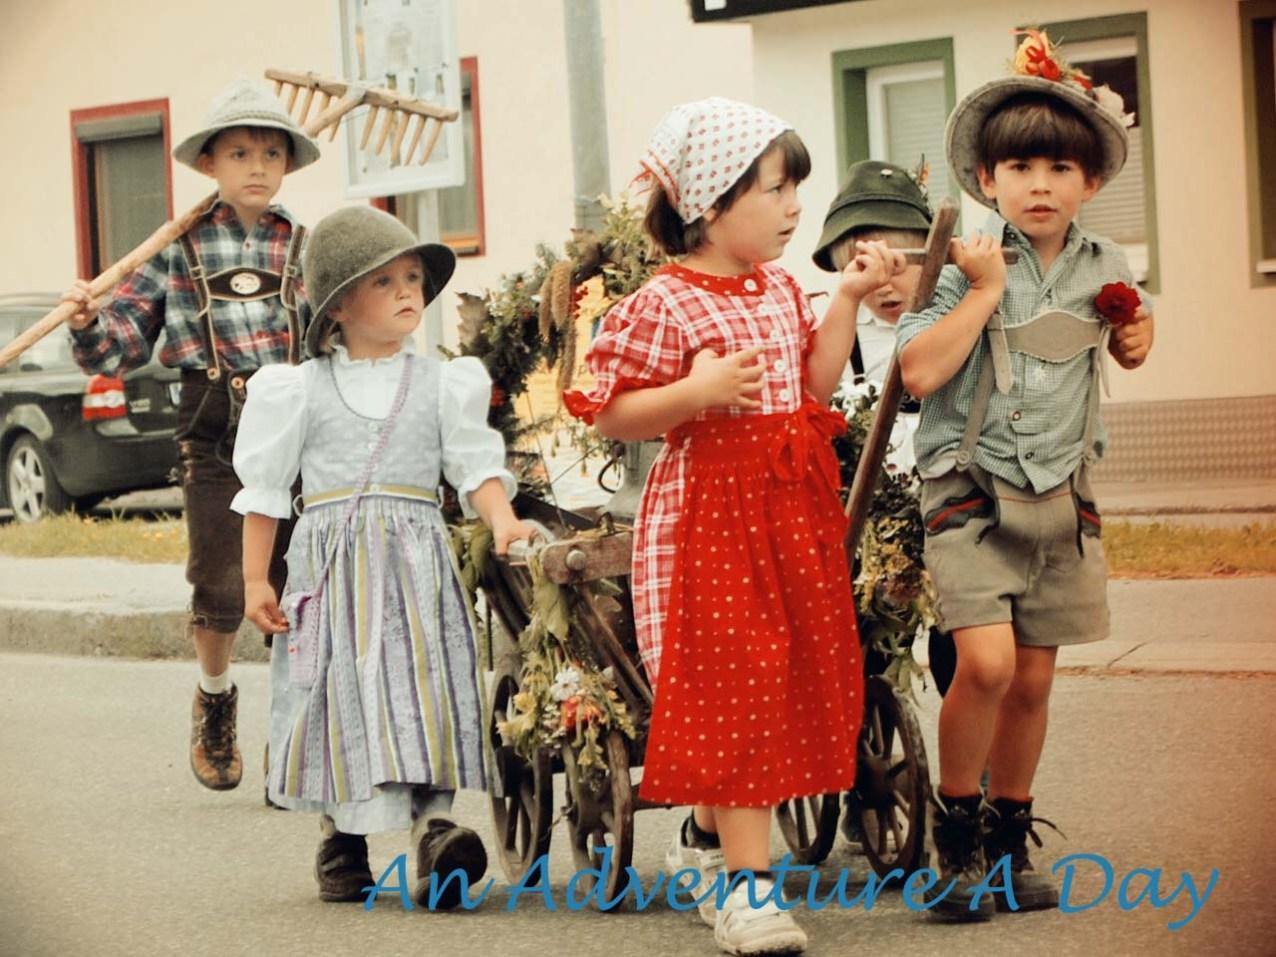 Children participate in the almabtrieb parade